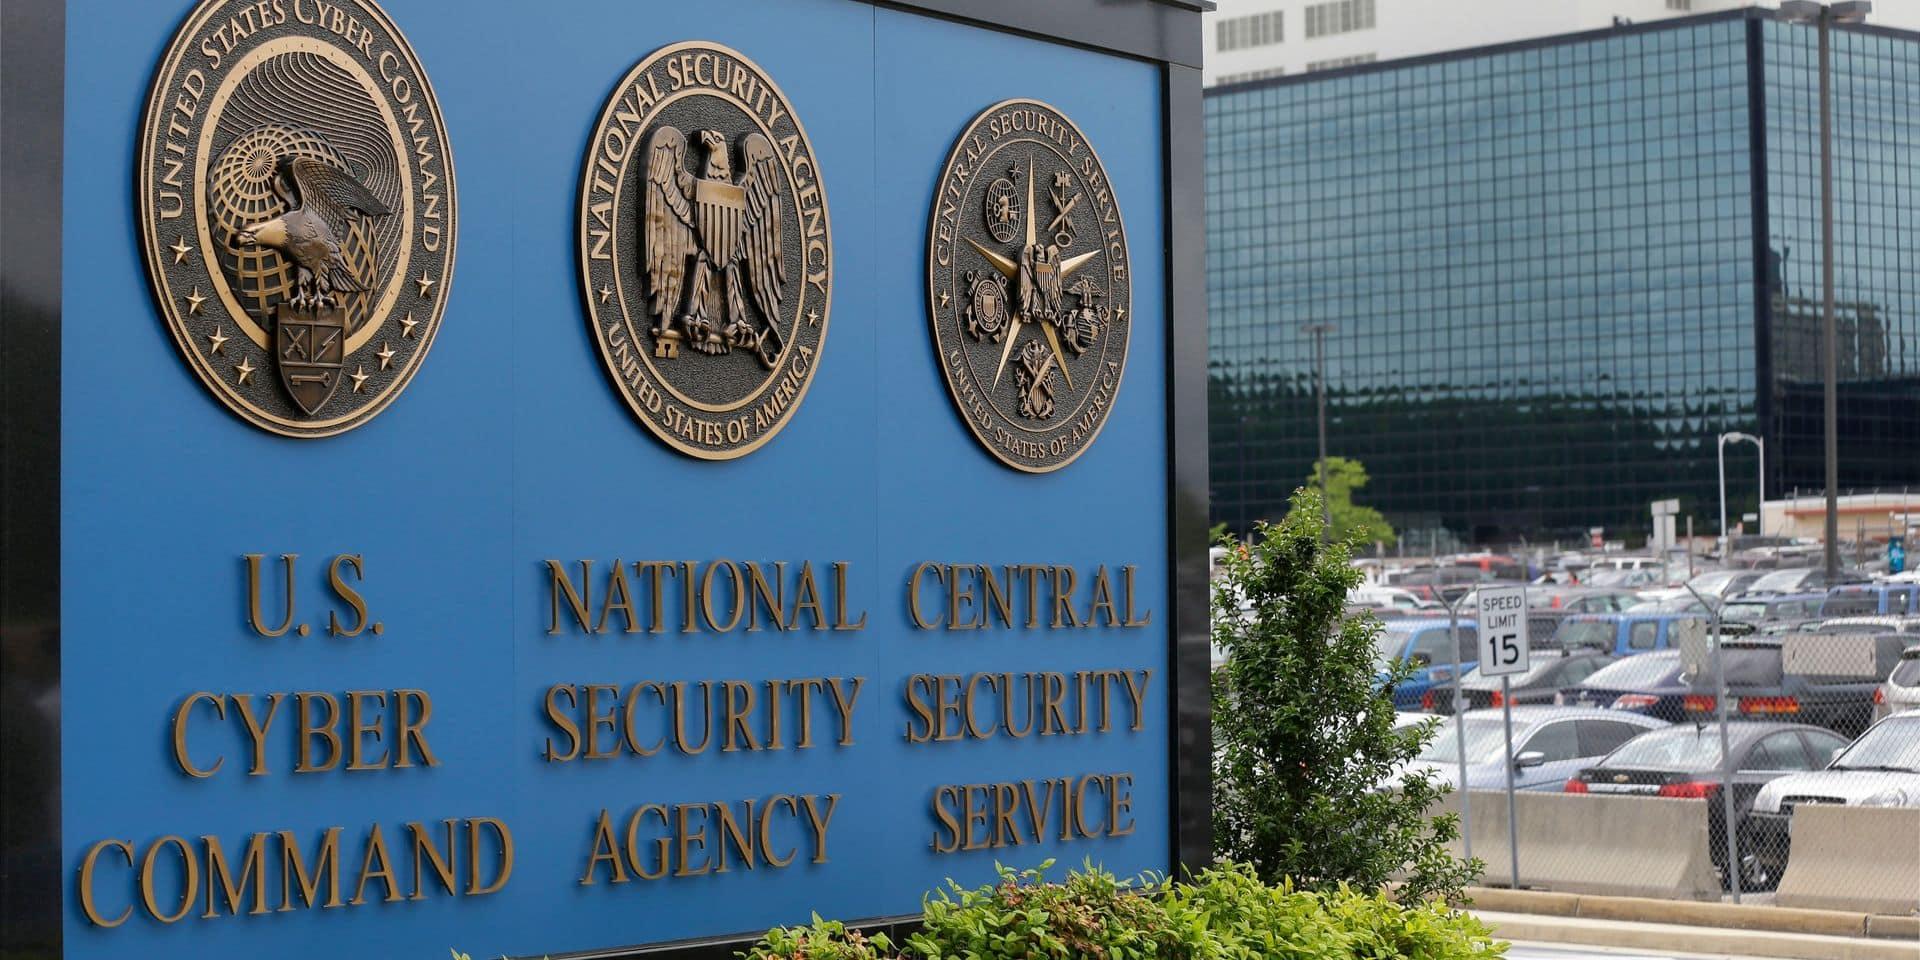 Cyberattaque aux Etats-Unis: Washington accuse la Russie